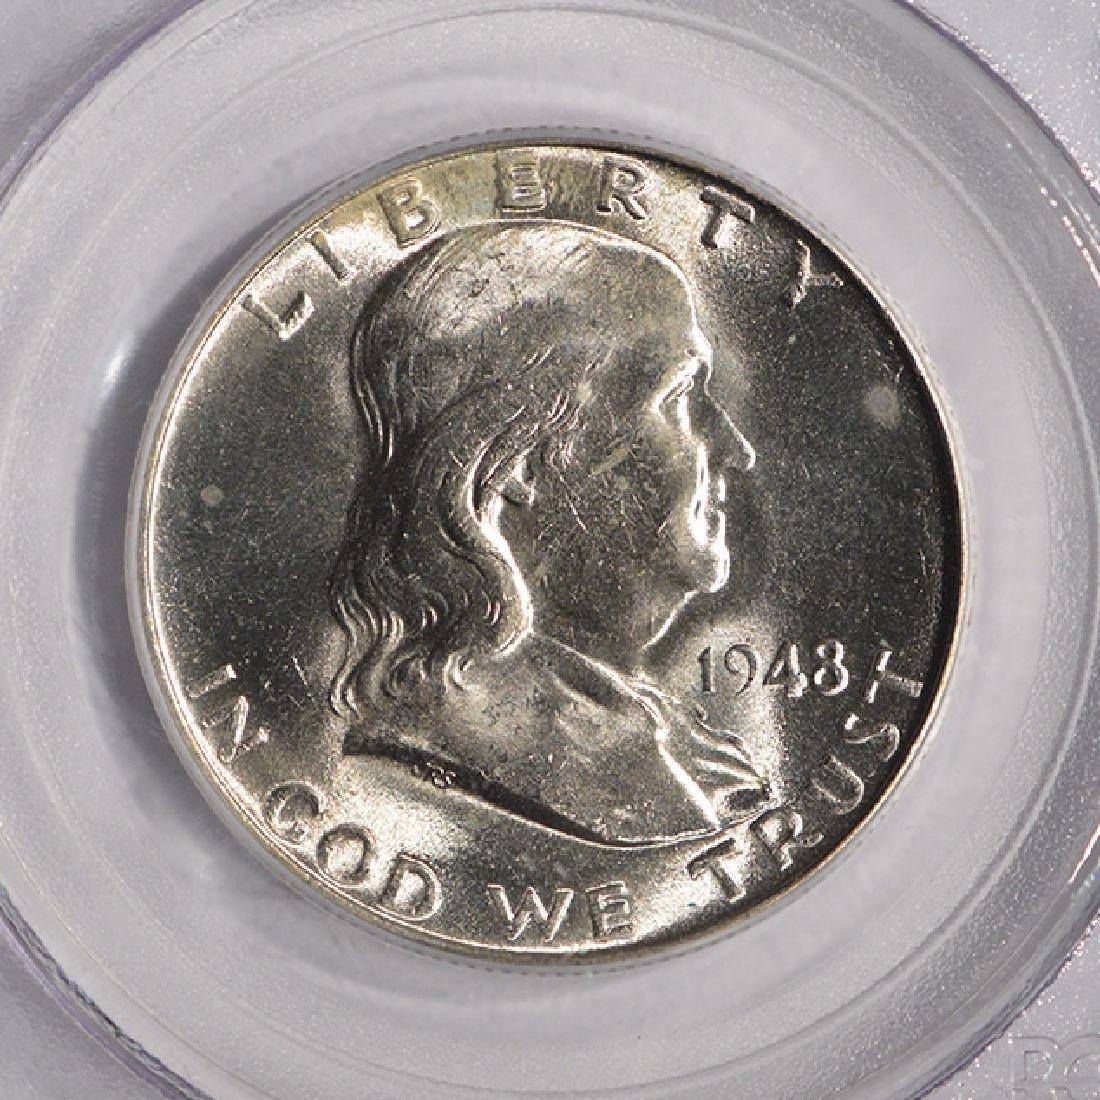 1948 Franklin Half Dollar Coin PCGS MS64FBL - 3